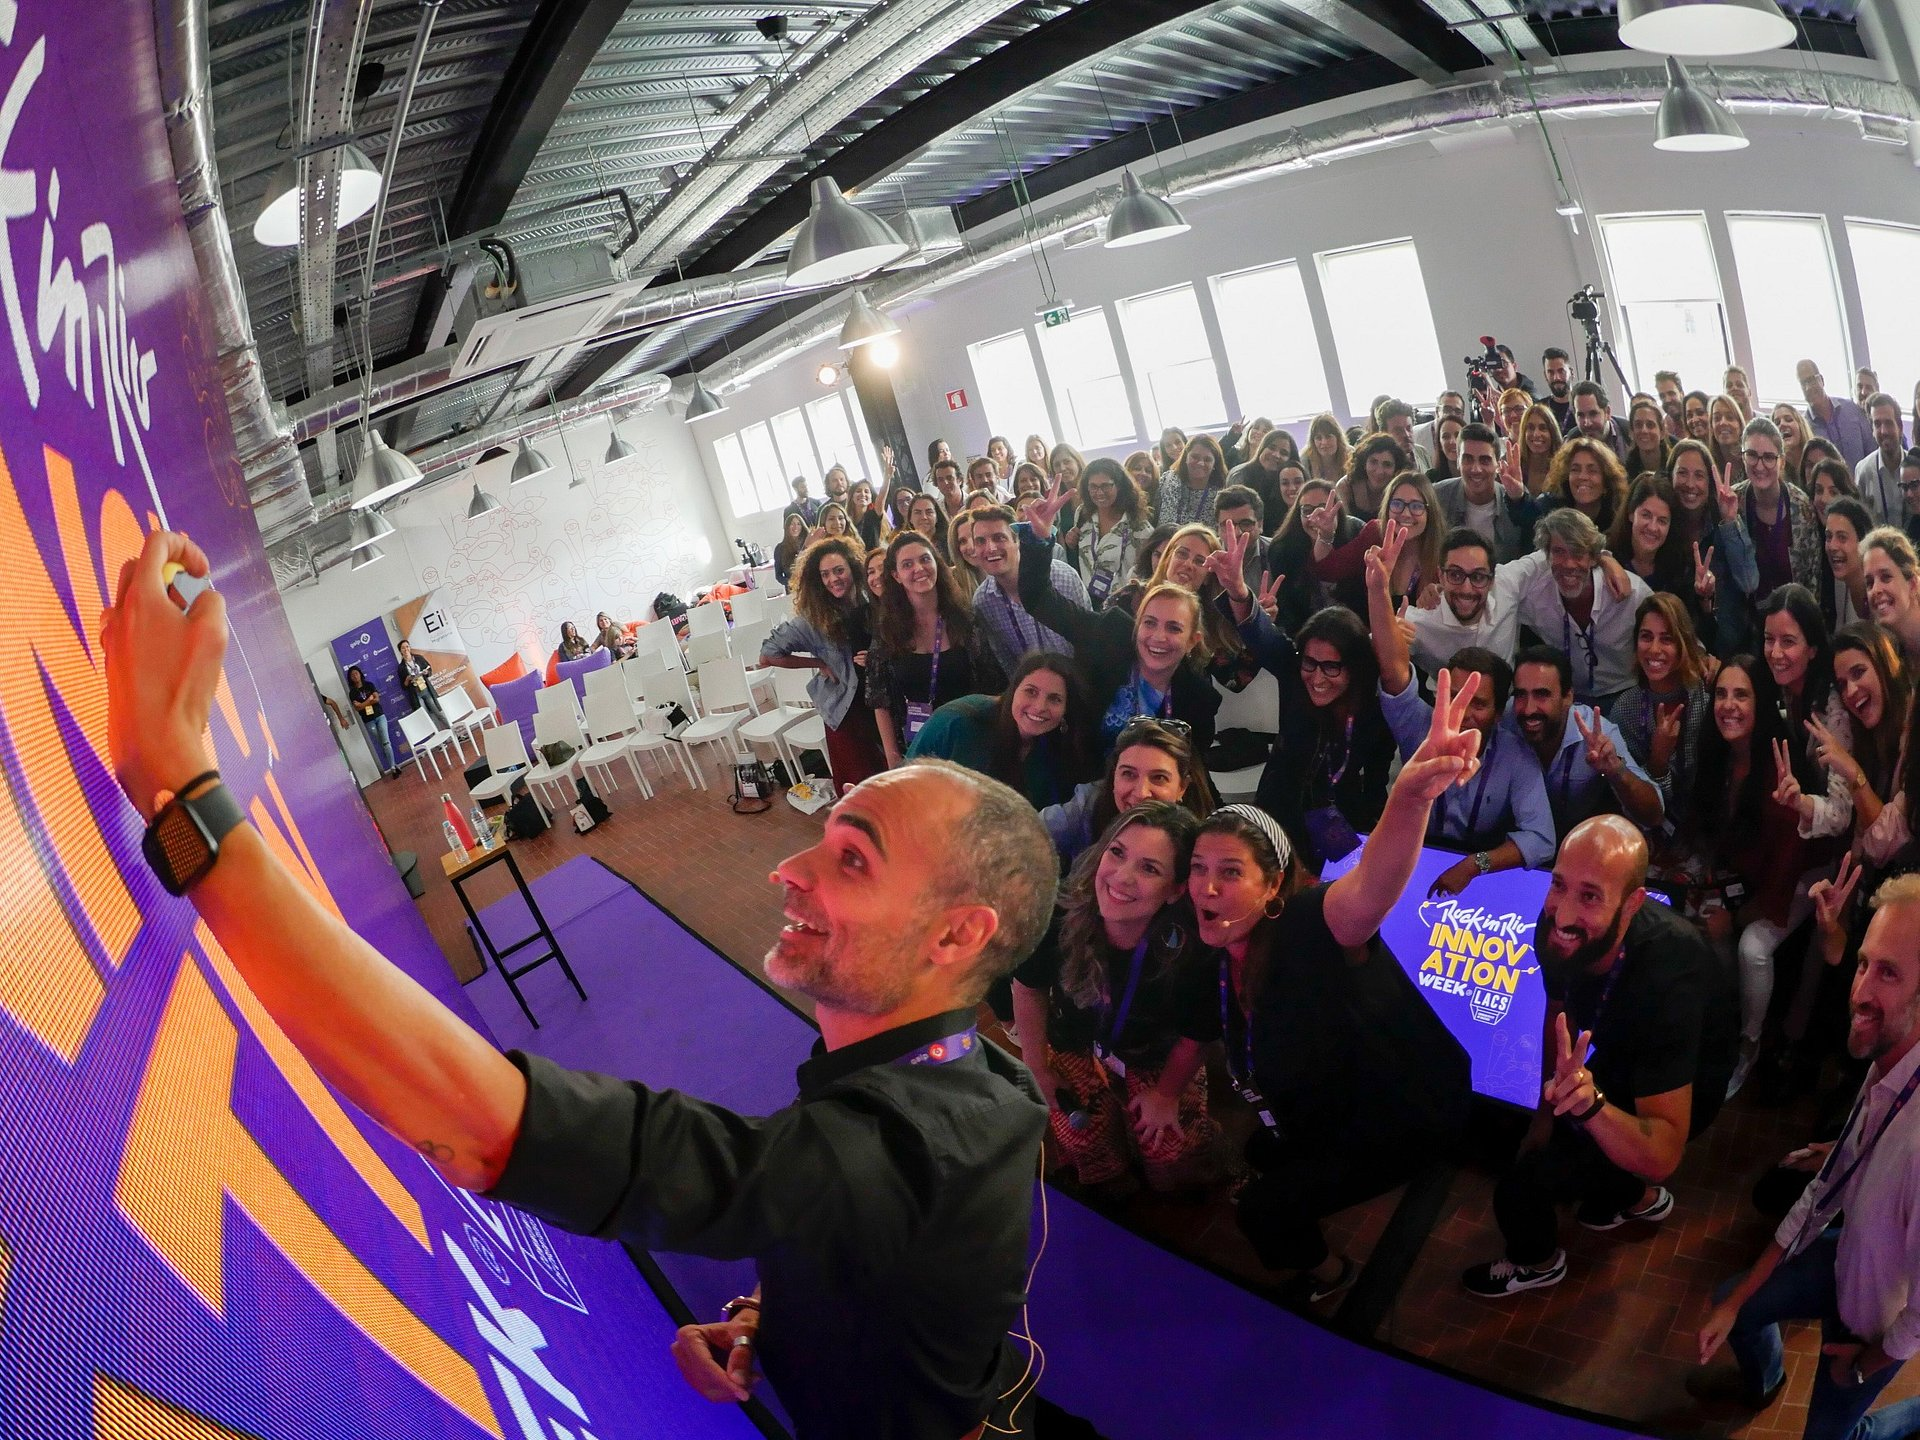 Anunciada a 3ª edição do Rock in Rio Innovation Week @LACS